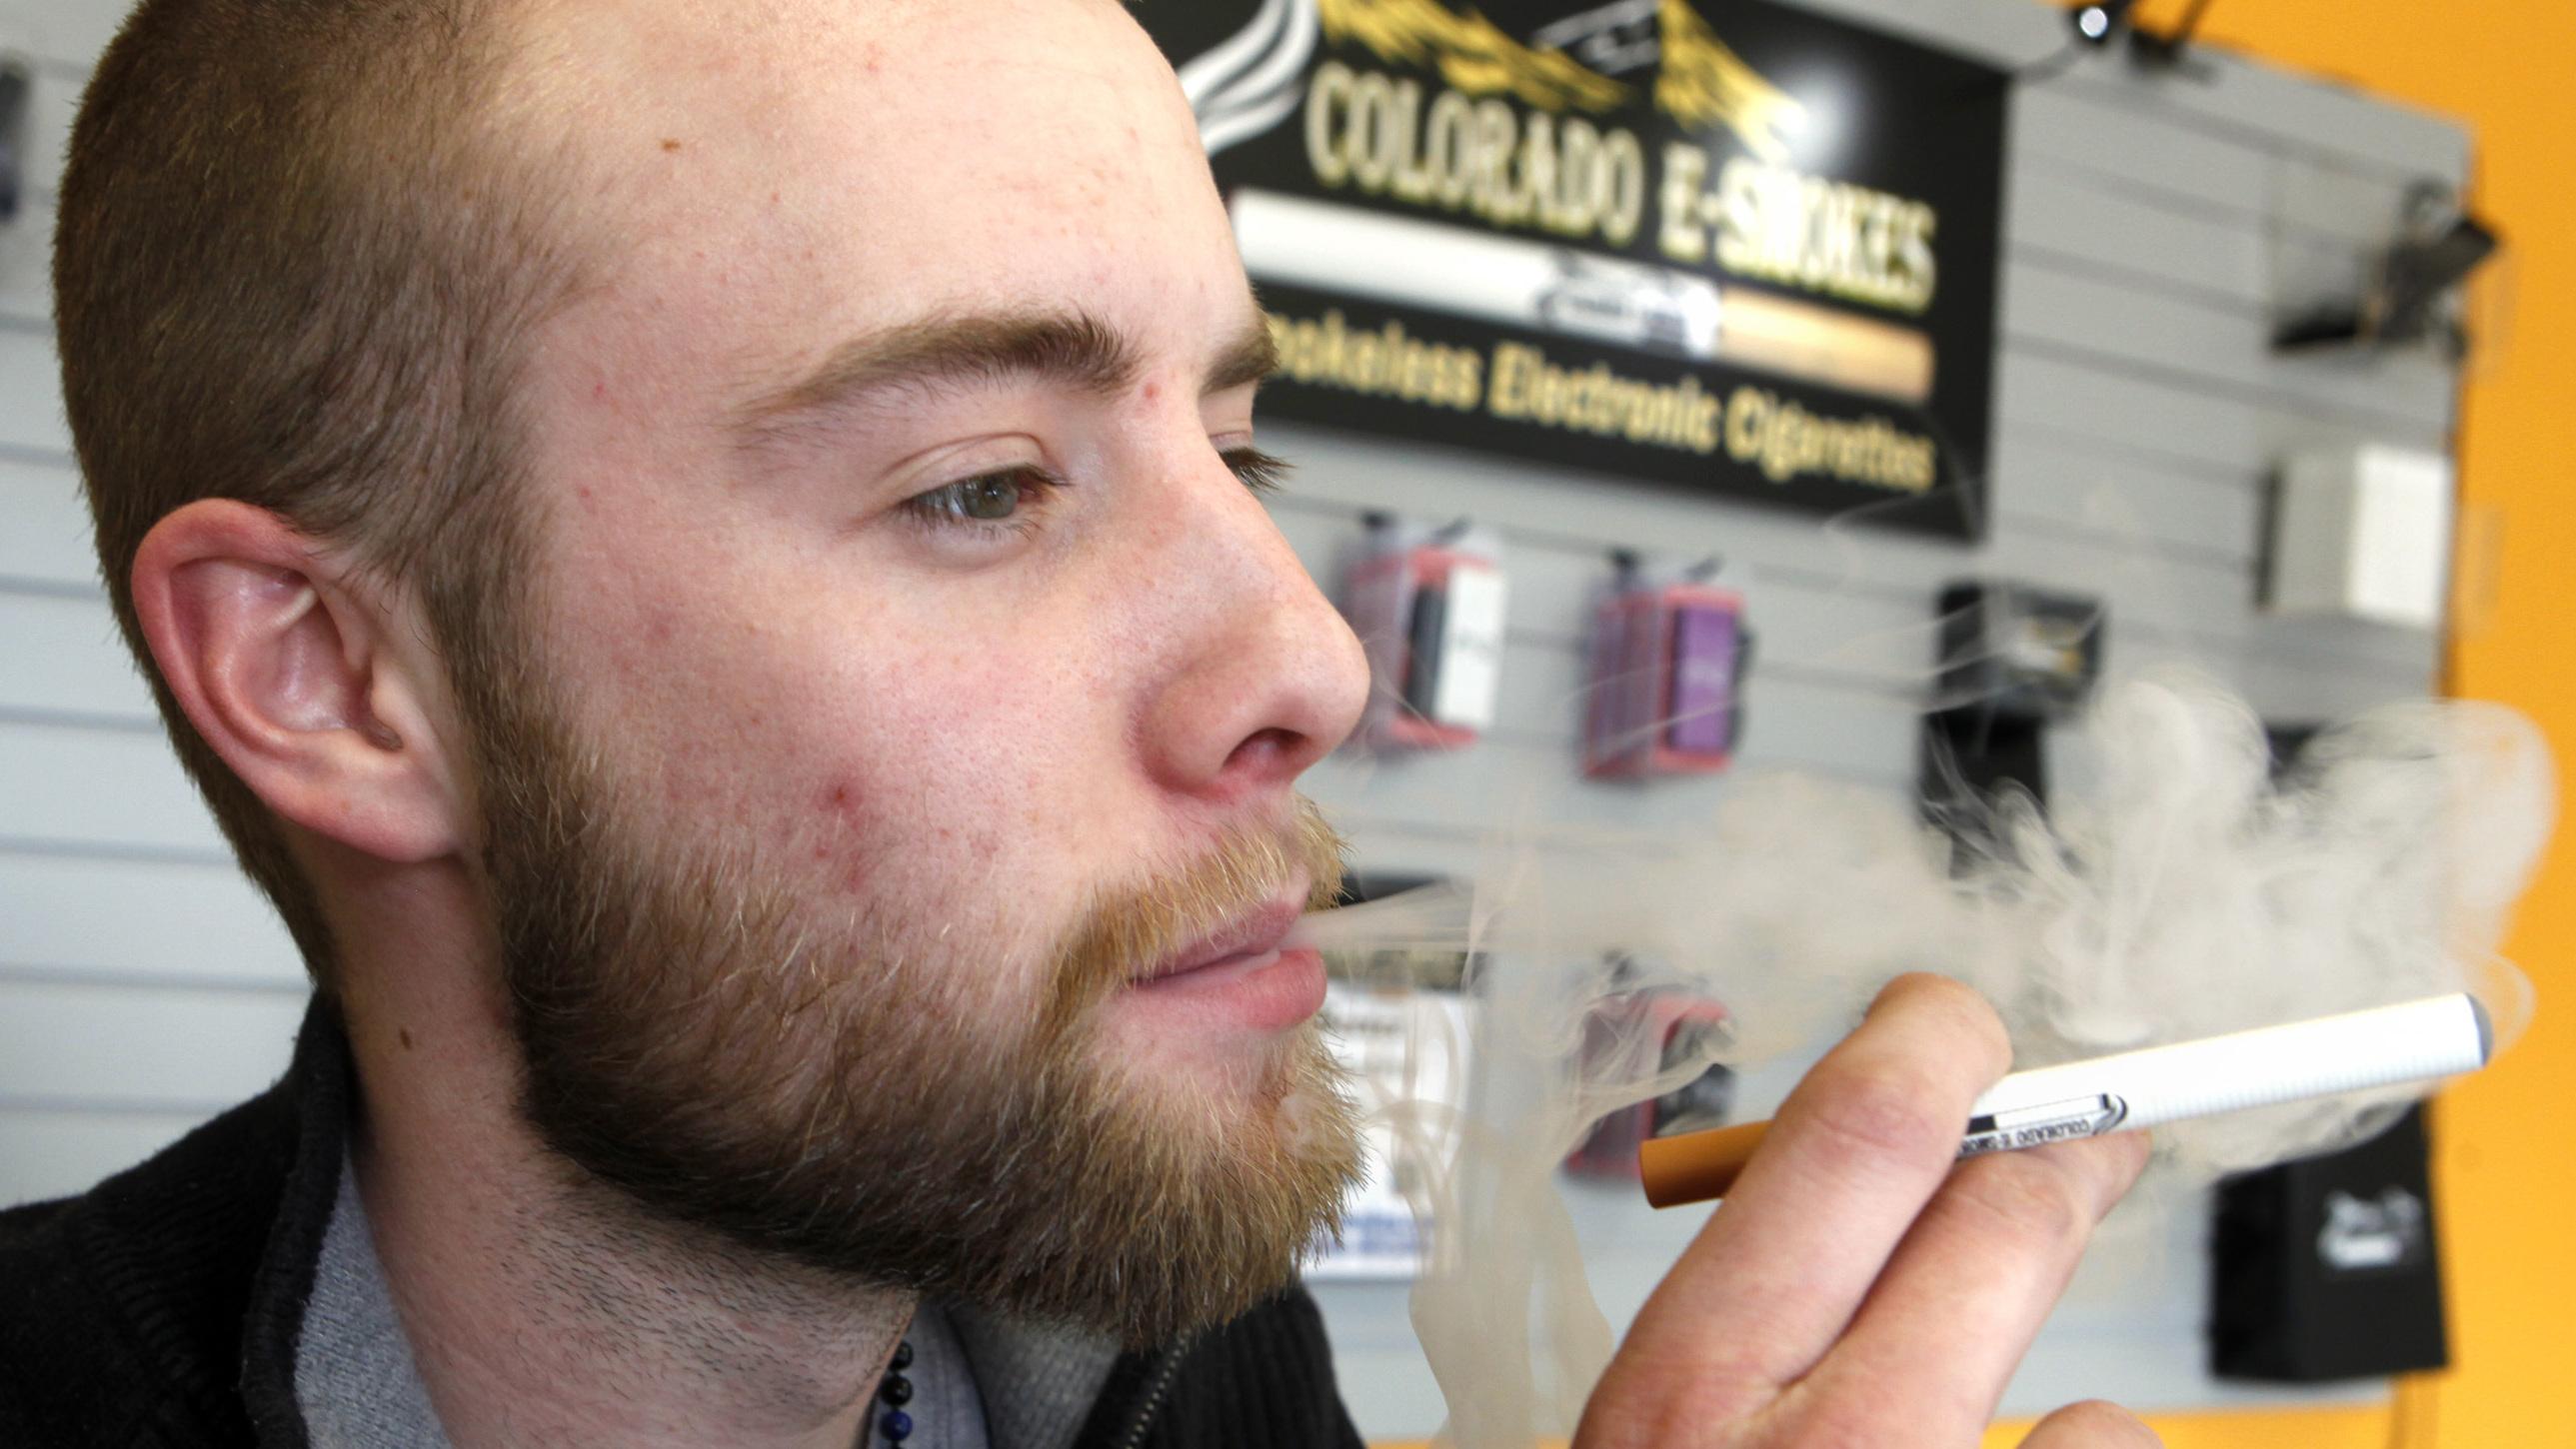 Lobbyists Amp Up Efforts To Sell Washington On E-Cigarettes